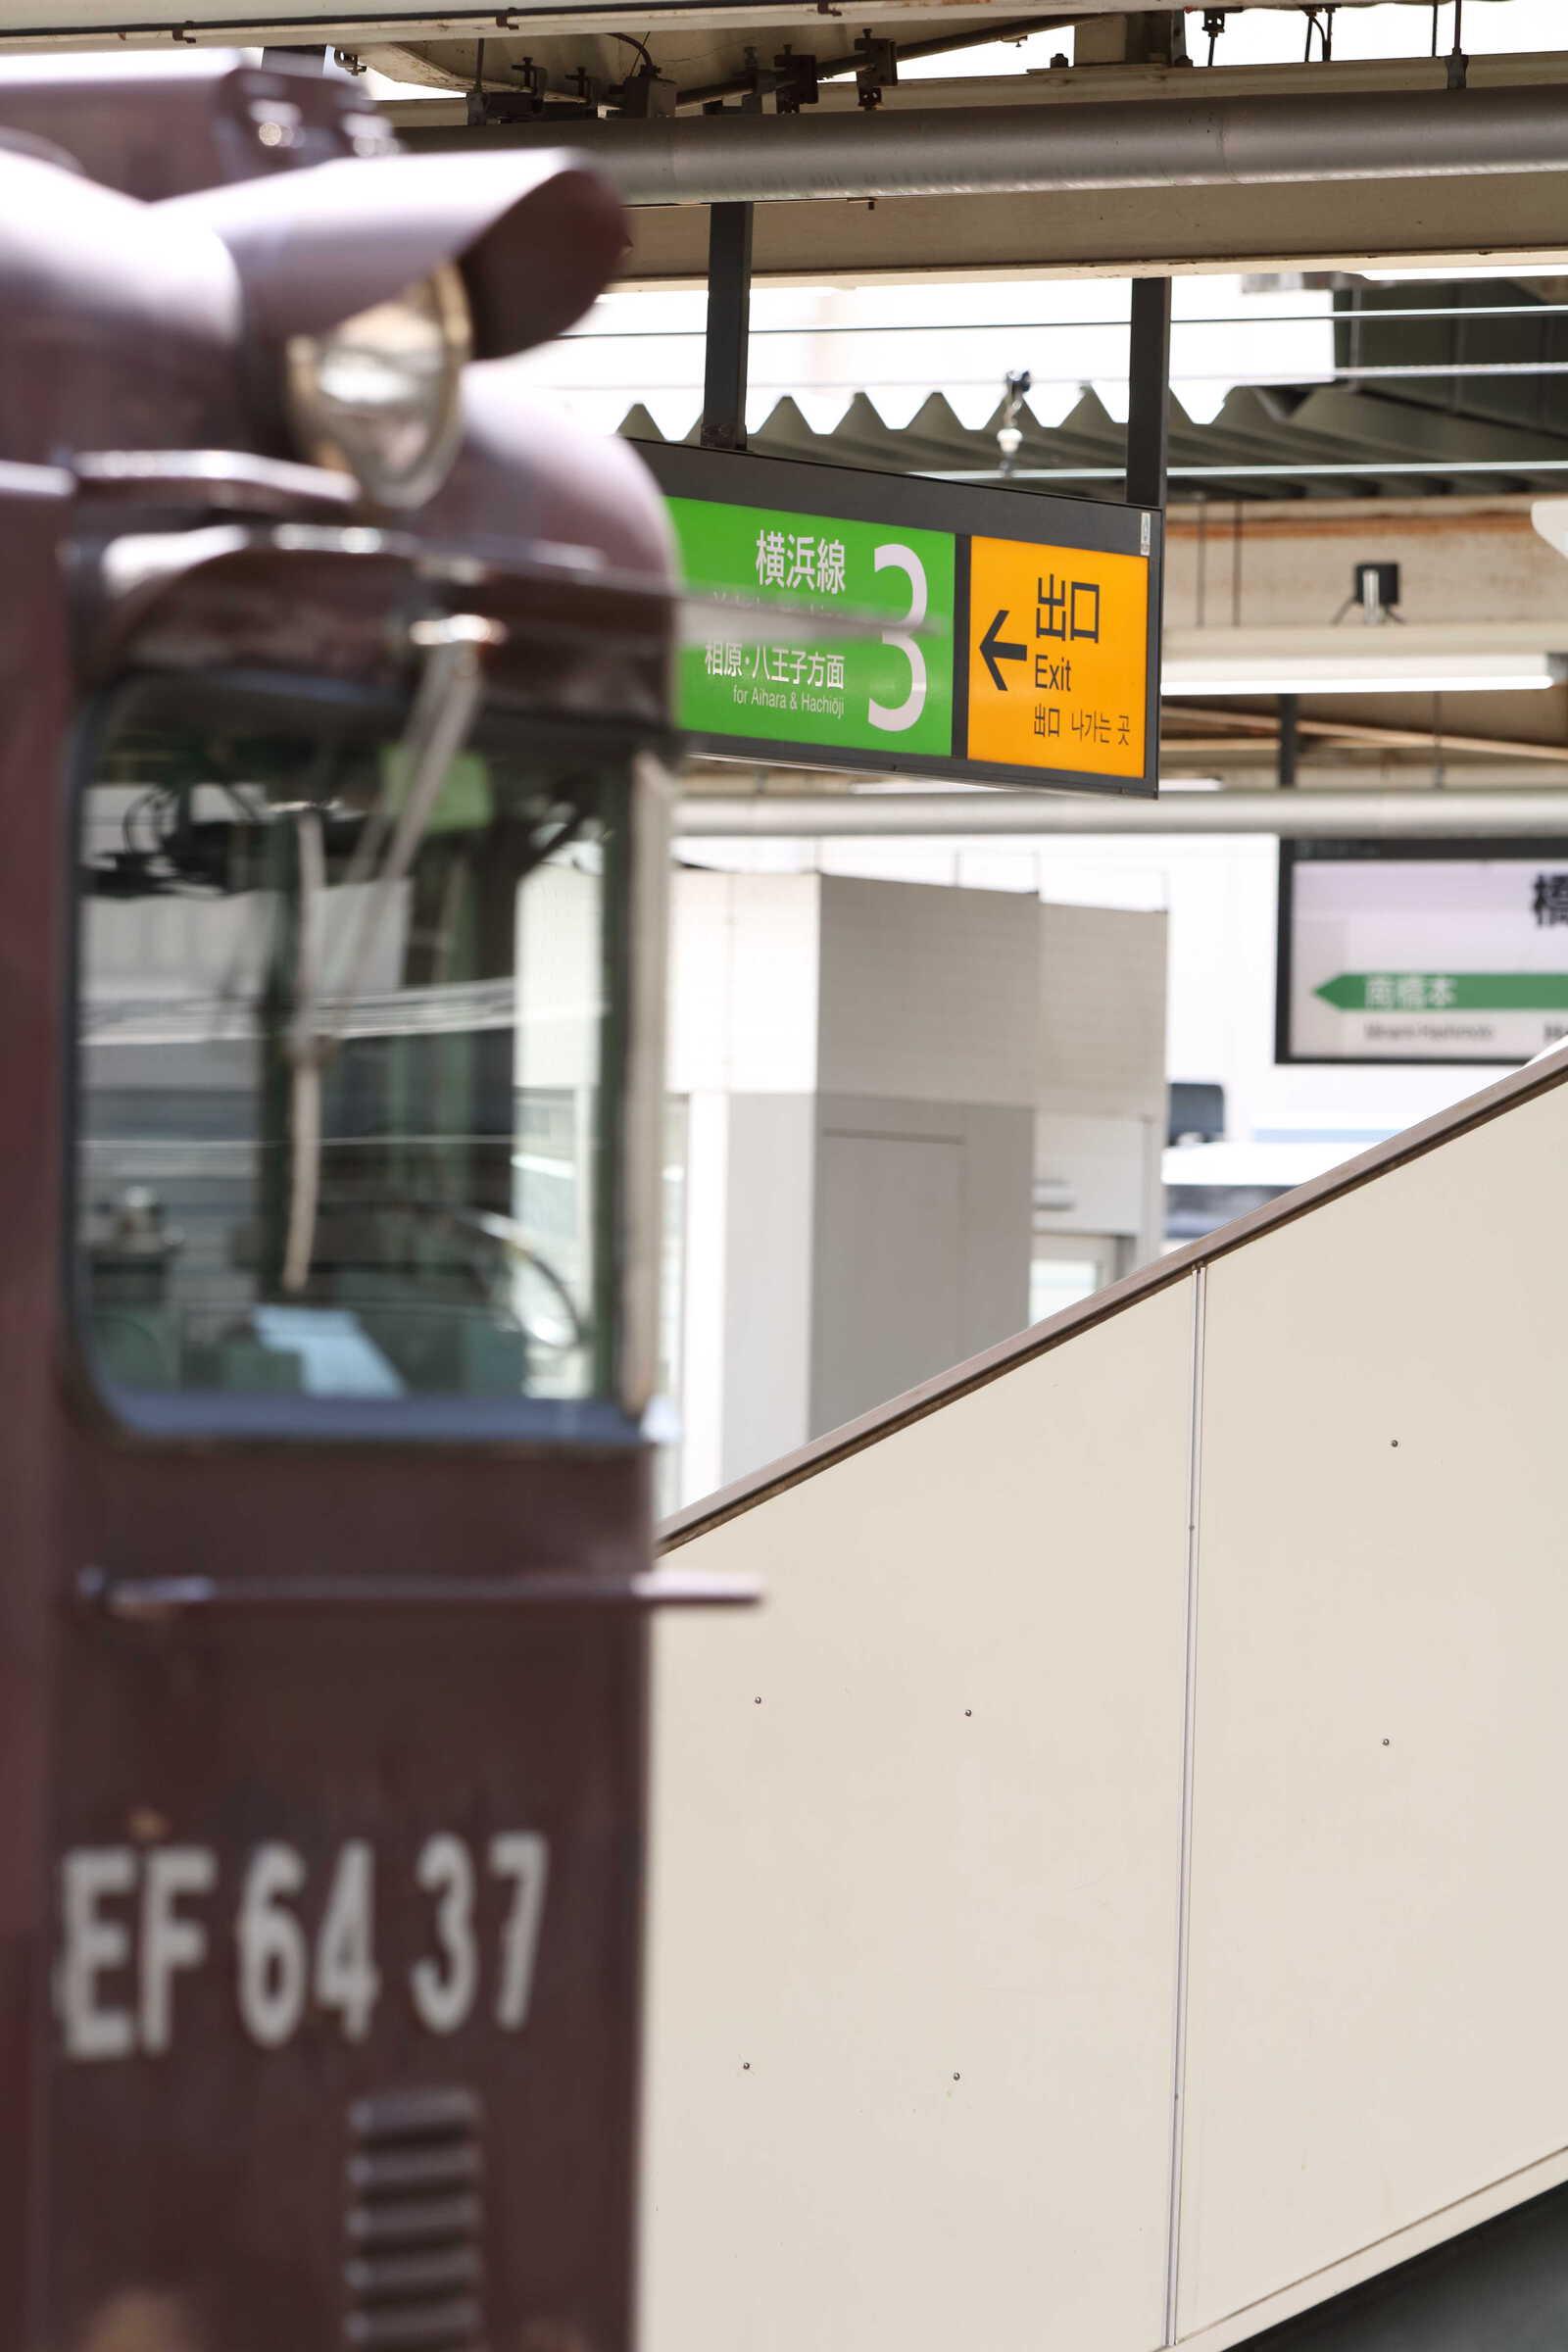 単9486列車 甲府運輸区横浜線ハンドル訓練 EF64-37[高]